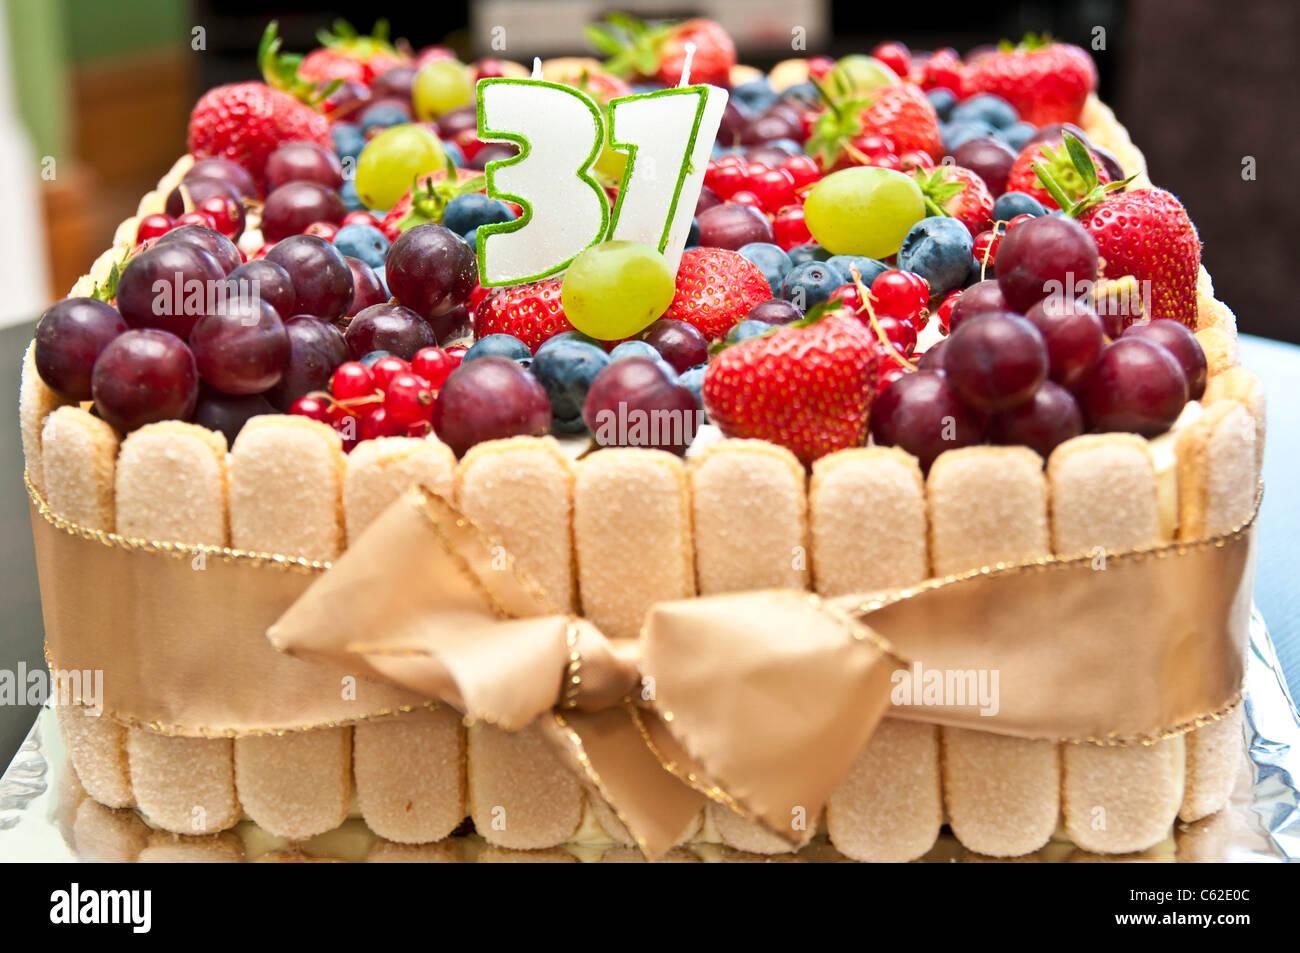 Fruit Birthday Cake Stock Photo 38163564